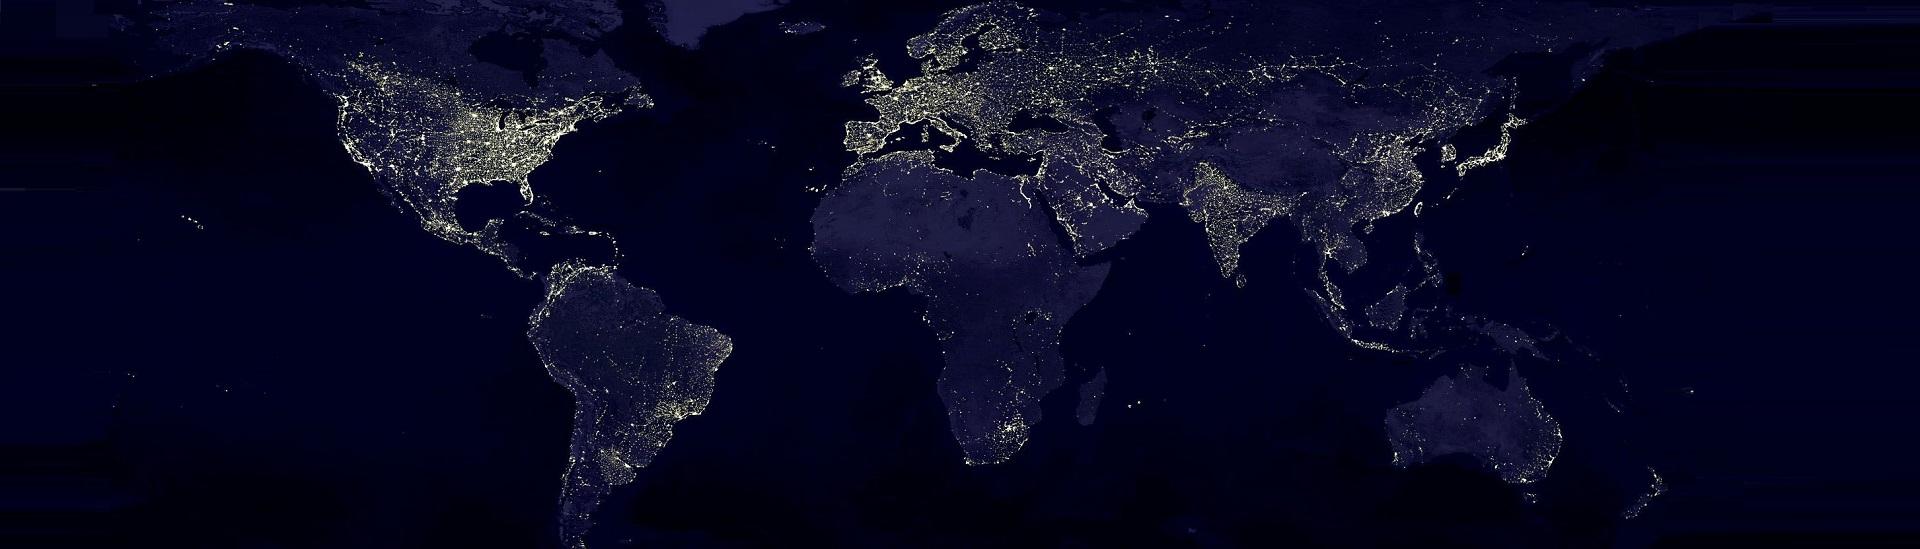 Dark Sky around the world